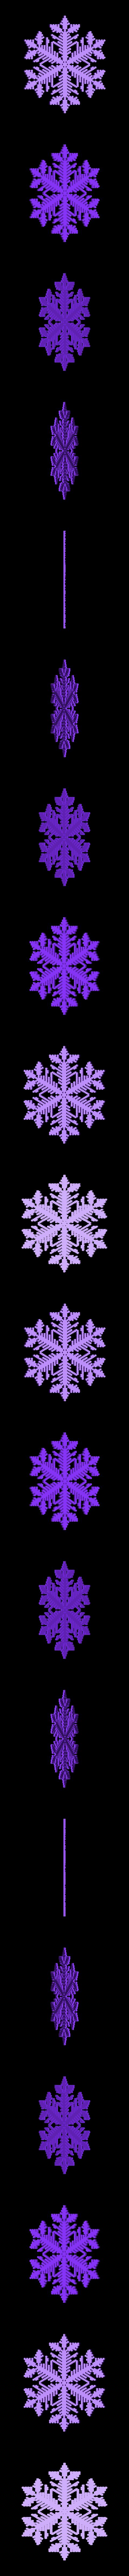 reiter40-var1.stl Download free STL file Snowflake growth simulation in BlocksCAD • 3D printing design, arpruss